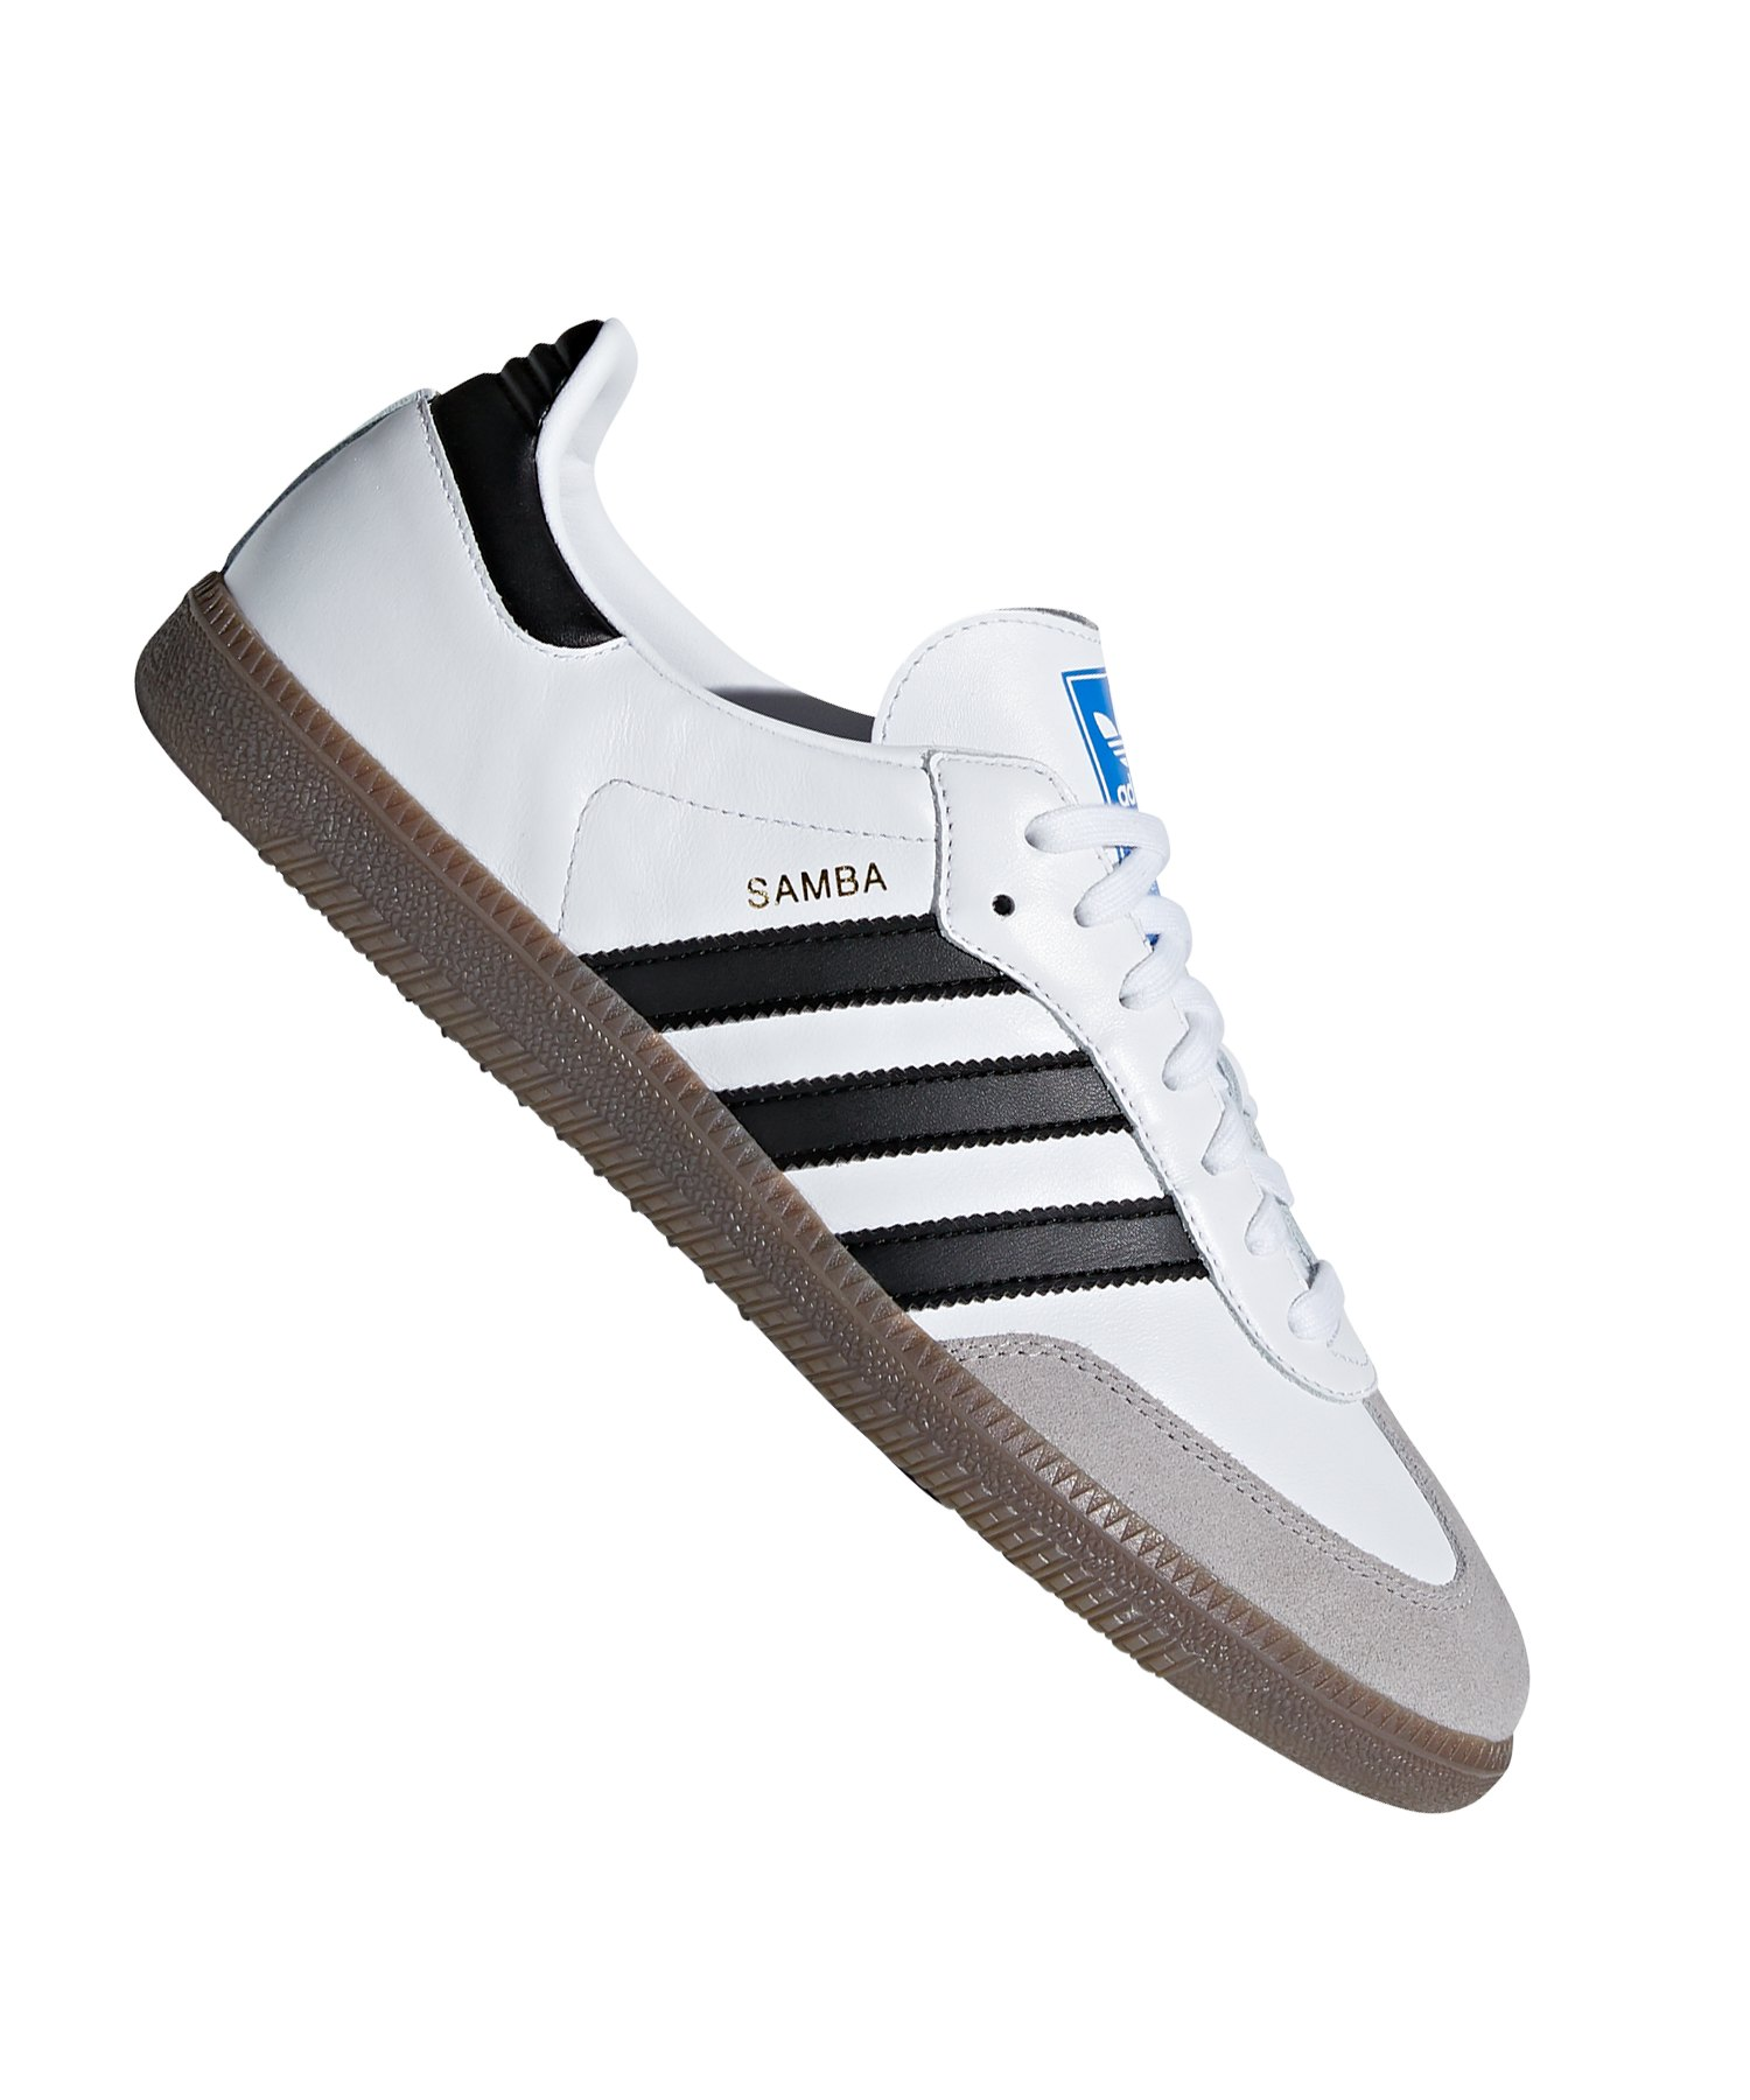 adidas Originals Samba OG Weiss Schwarz